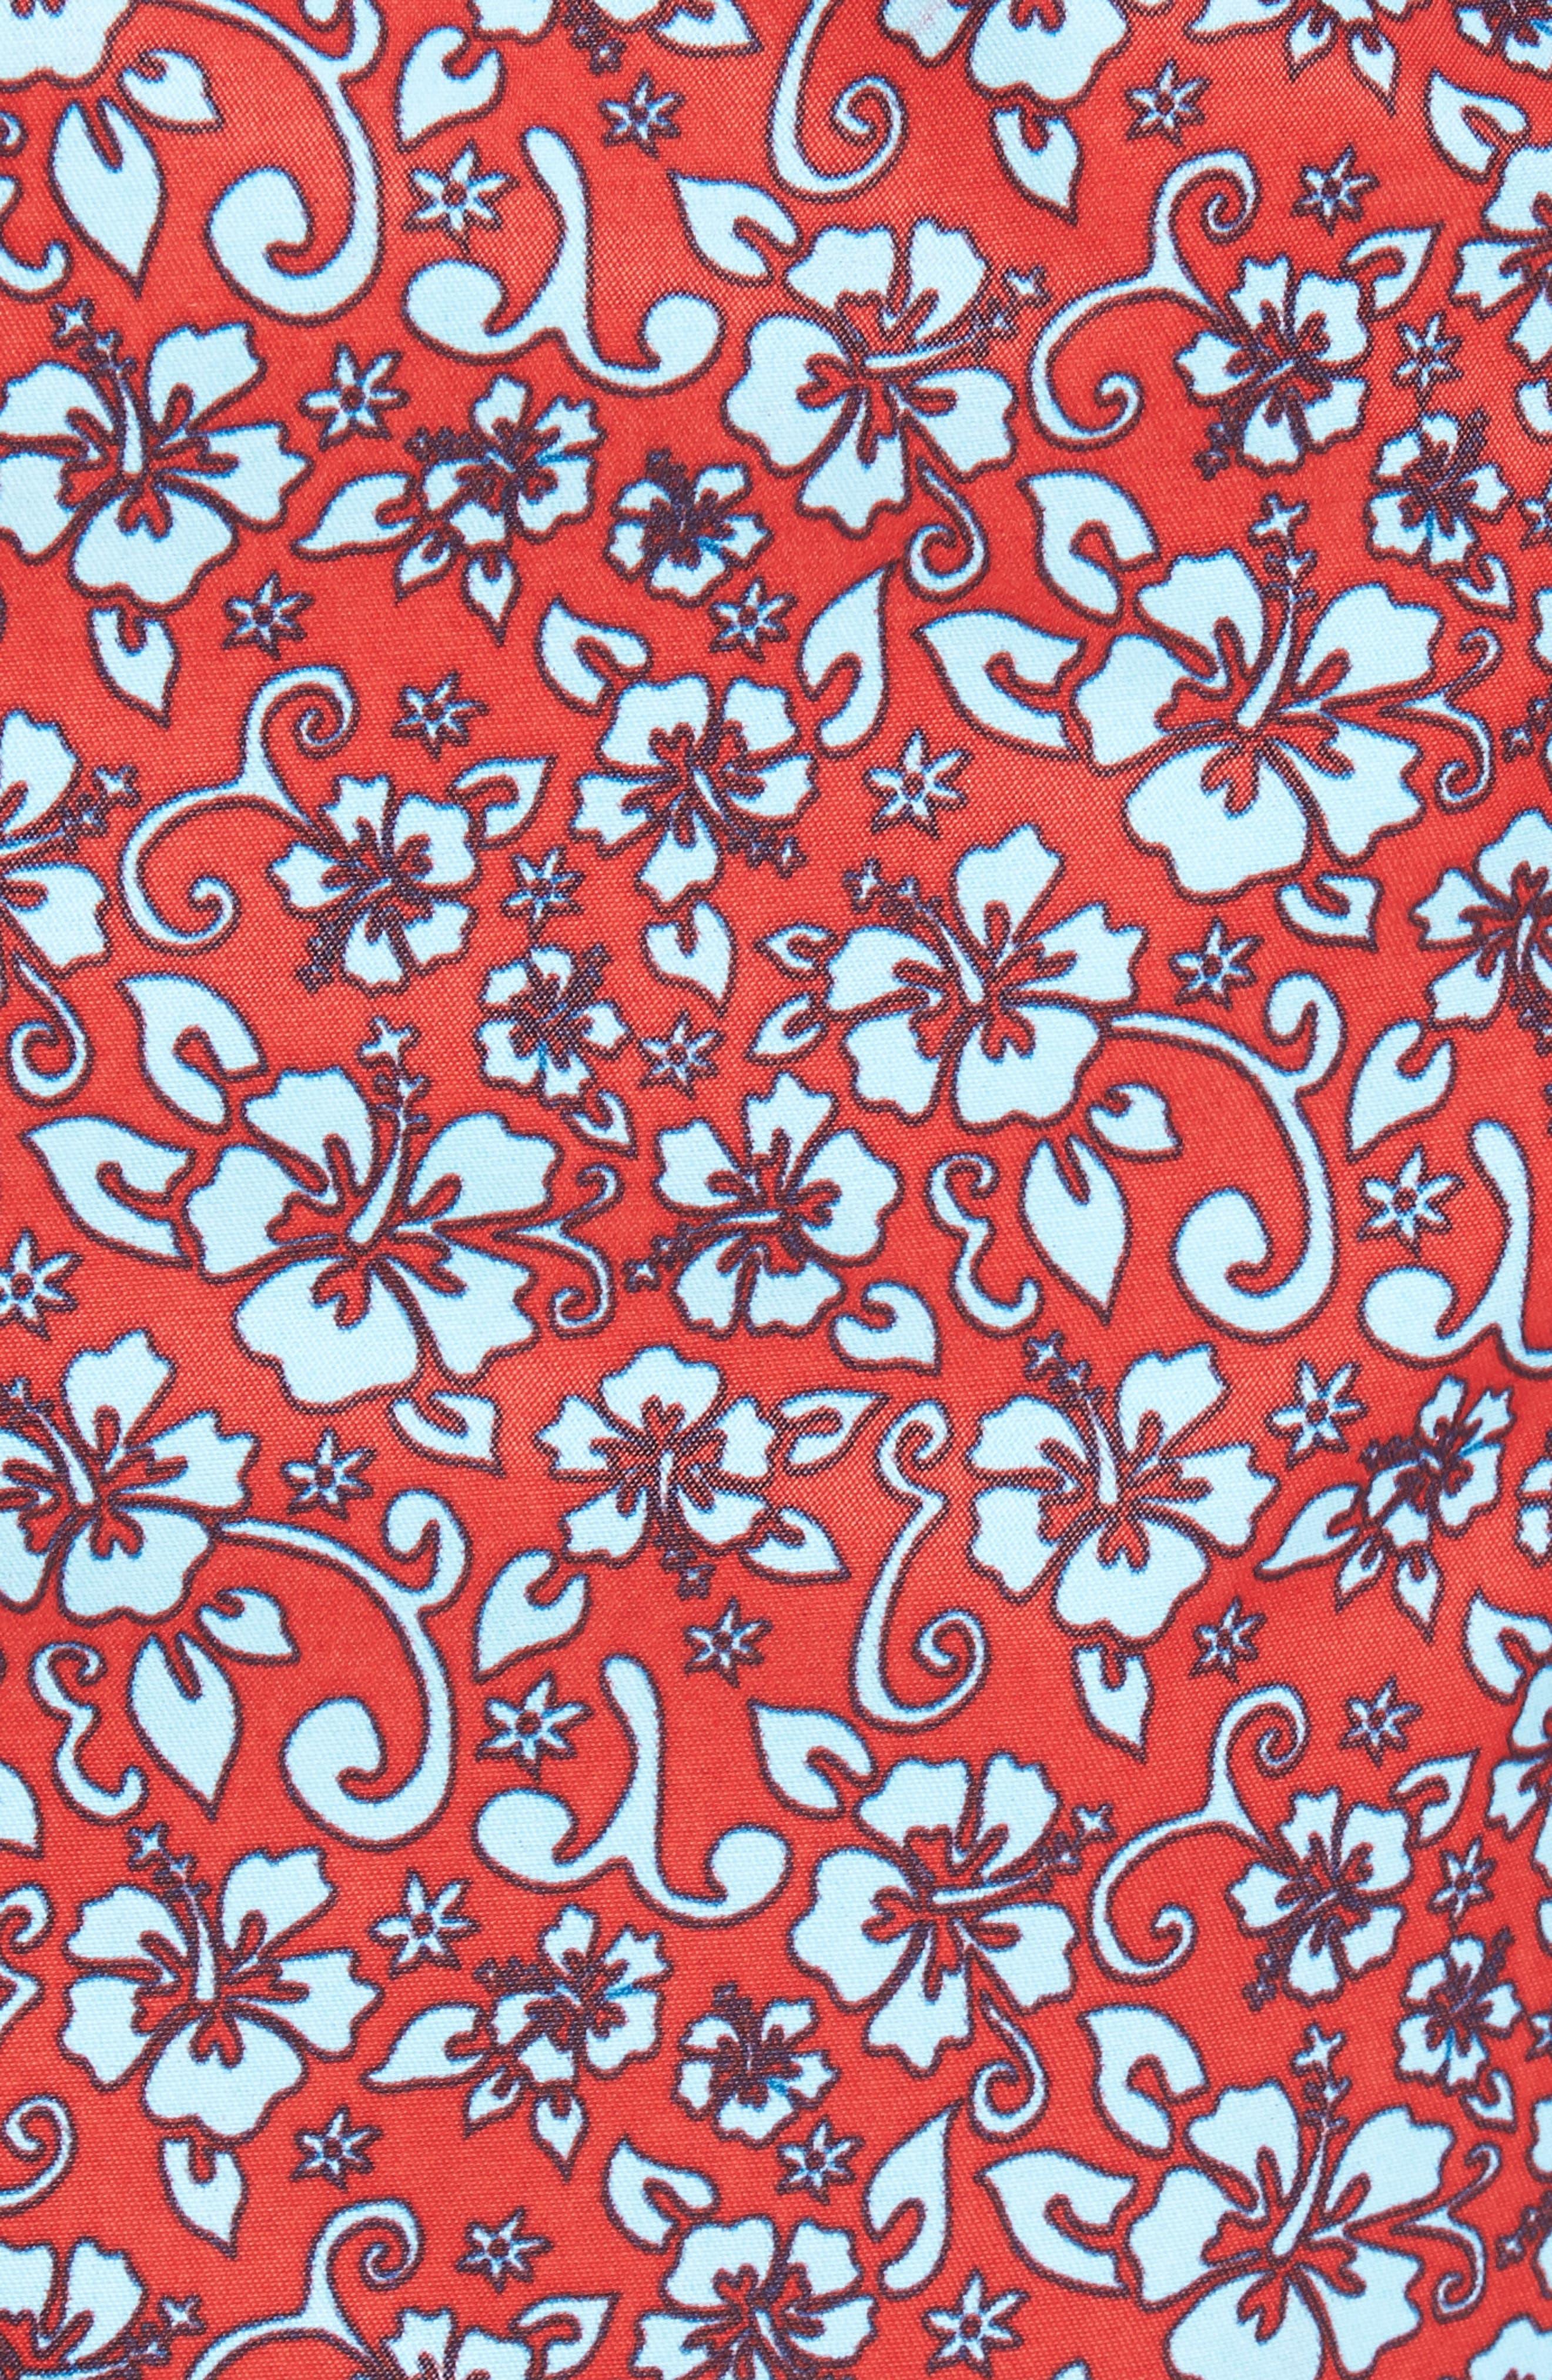 Mr. Swim Trim Fit Floral Swim Trunks,                             Alternate thumbnail 5, color,                             Red